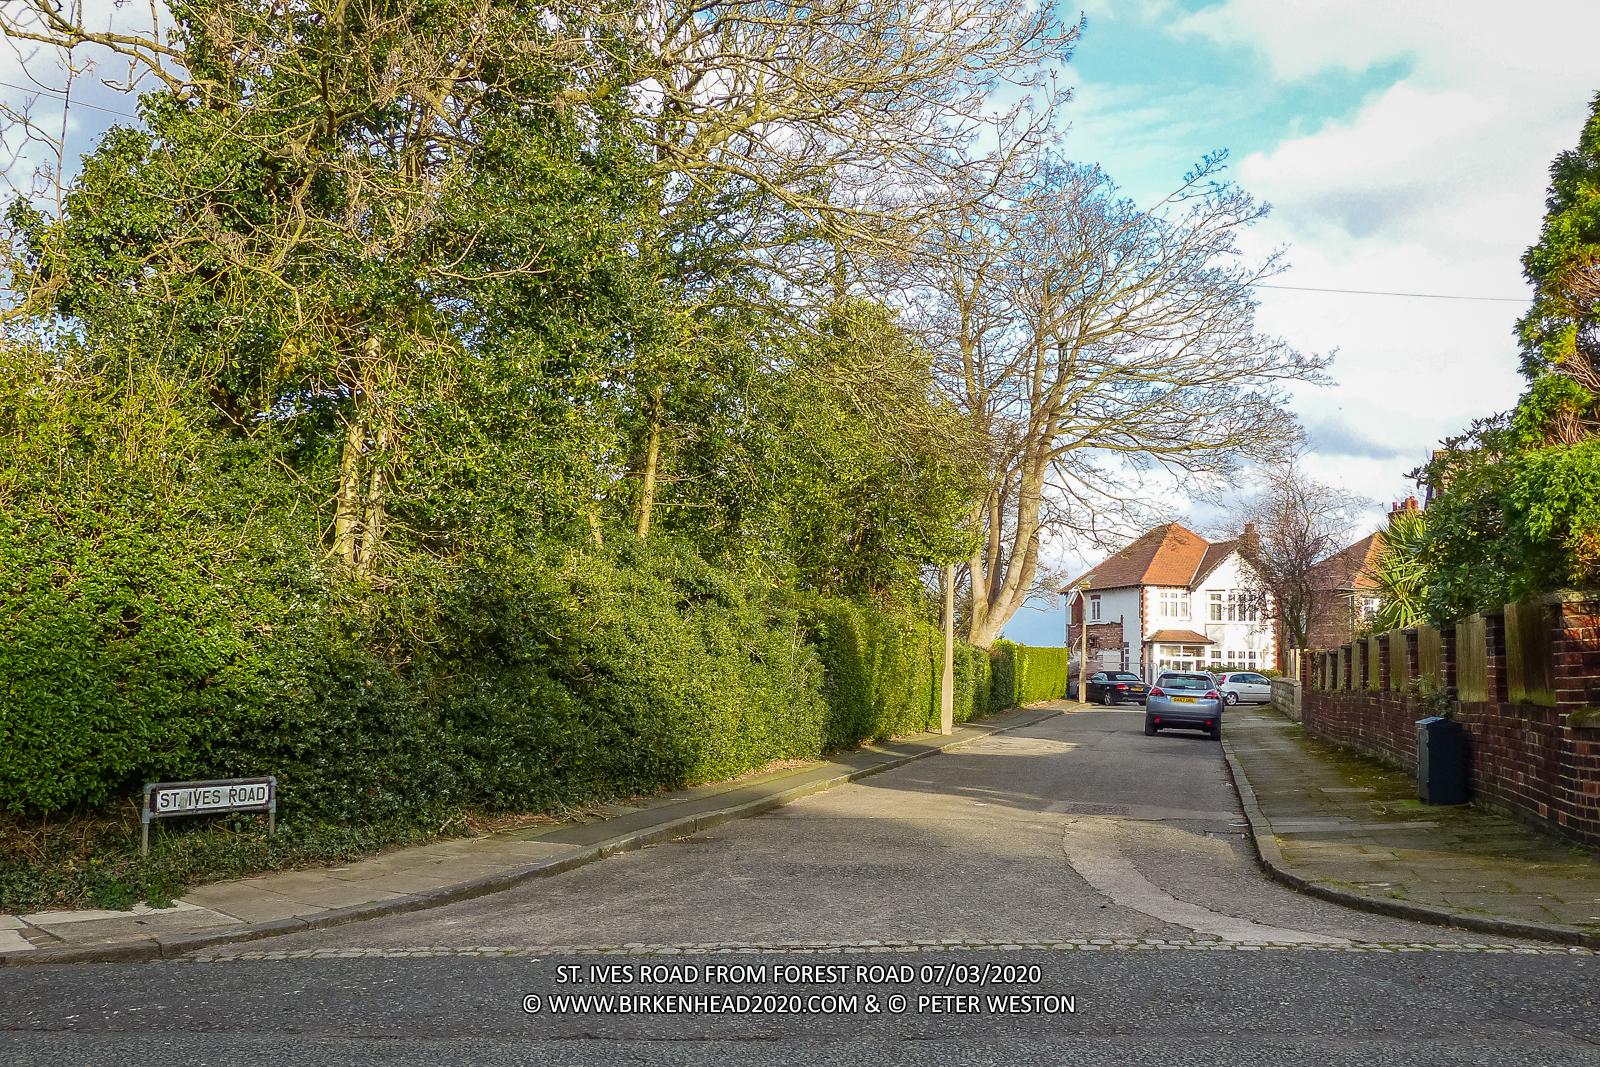 St. Ives Road